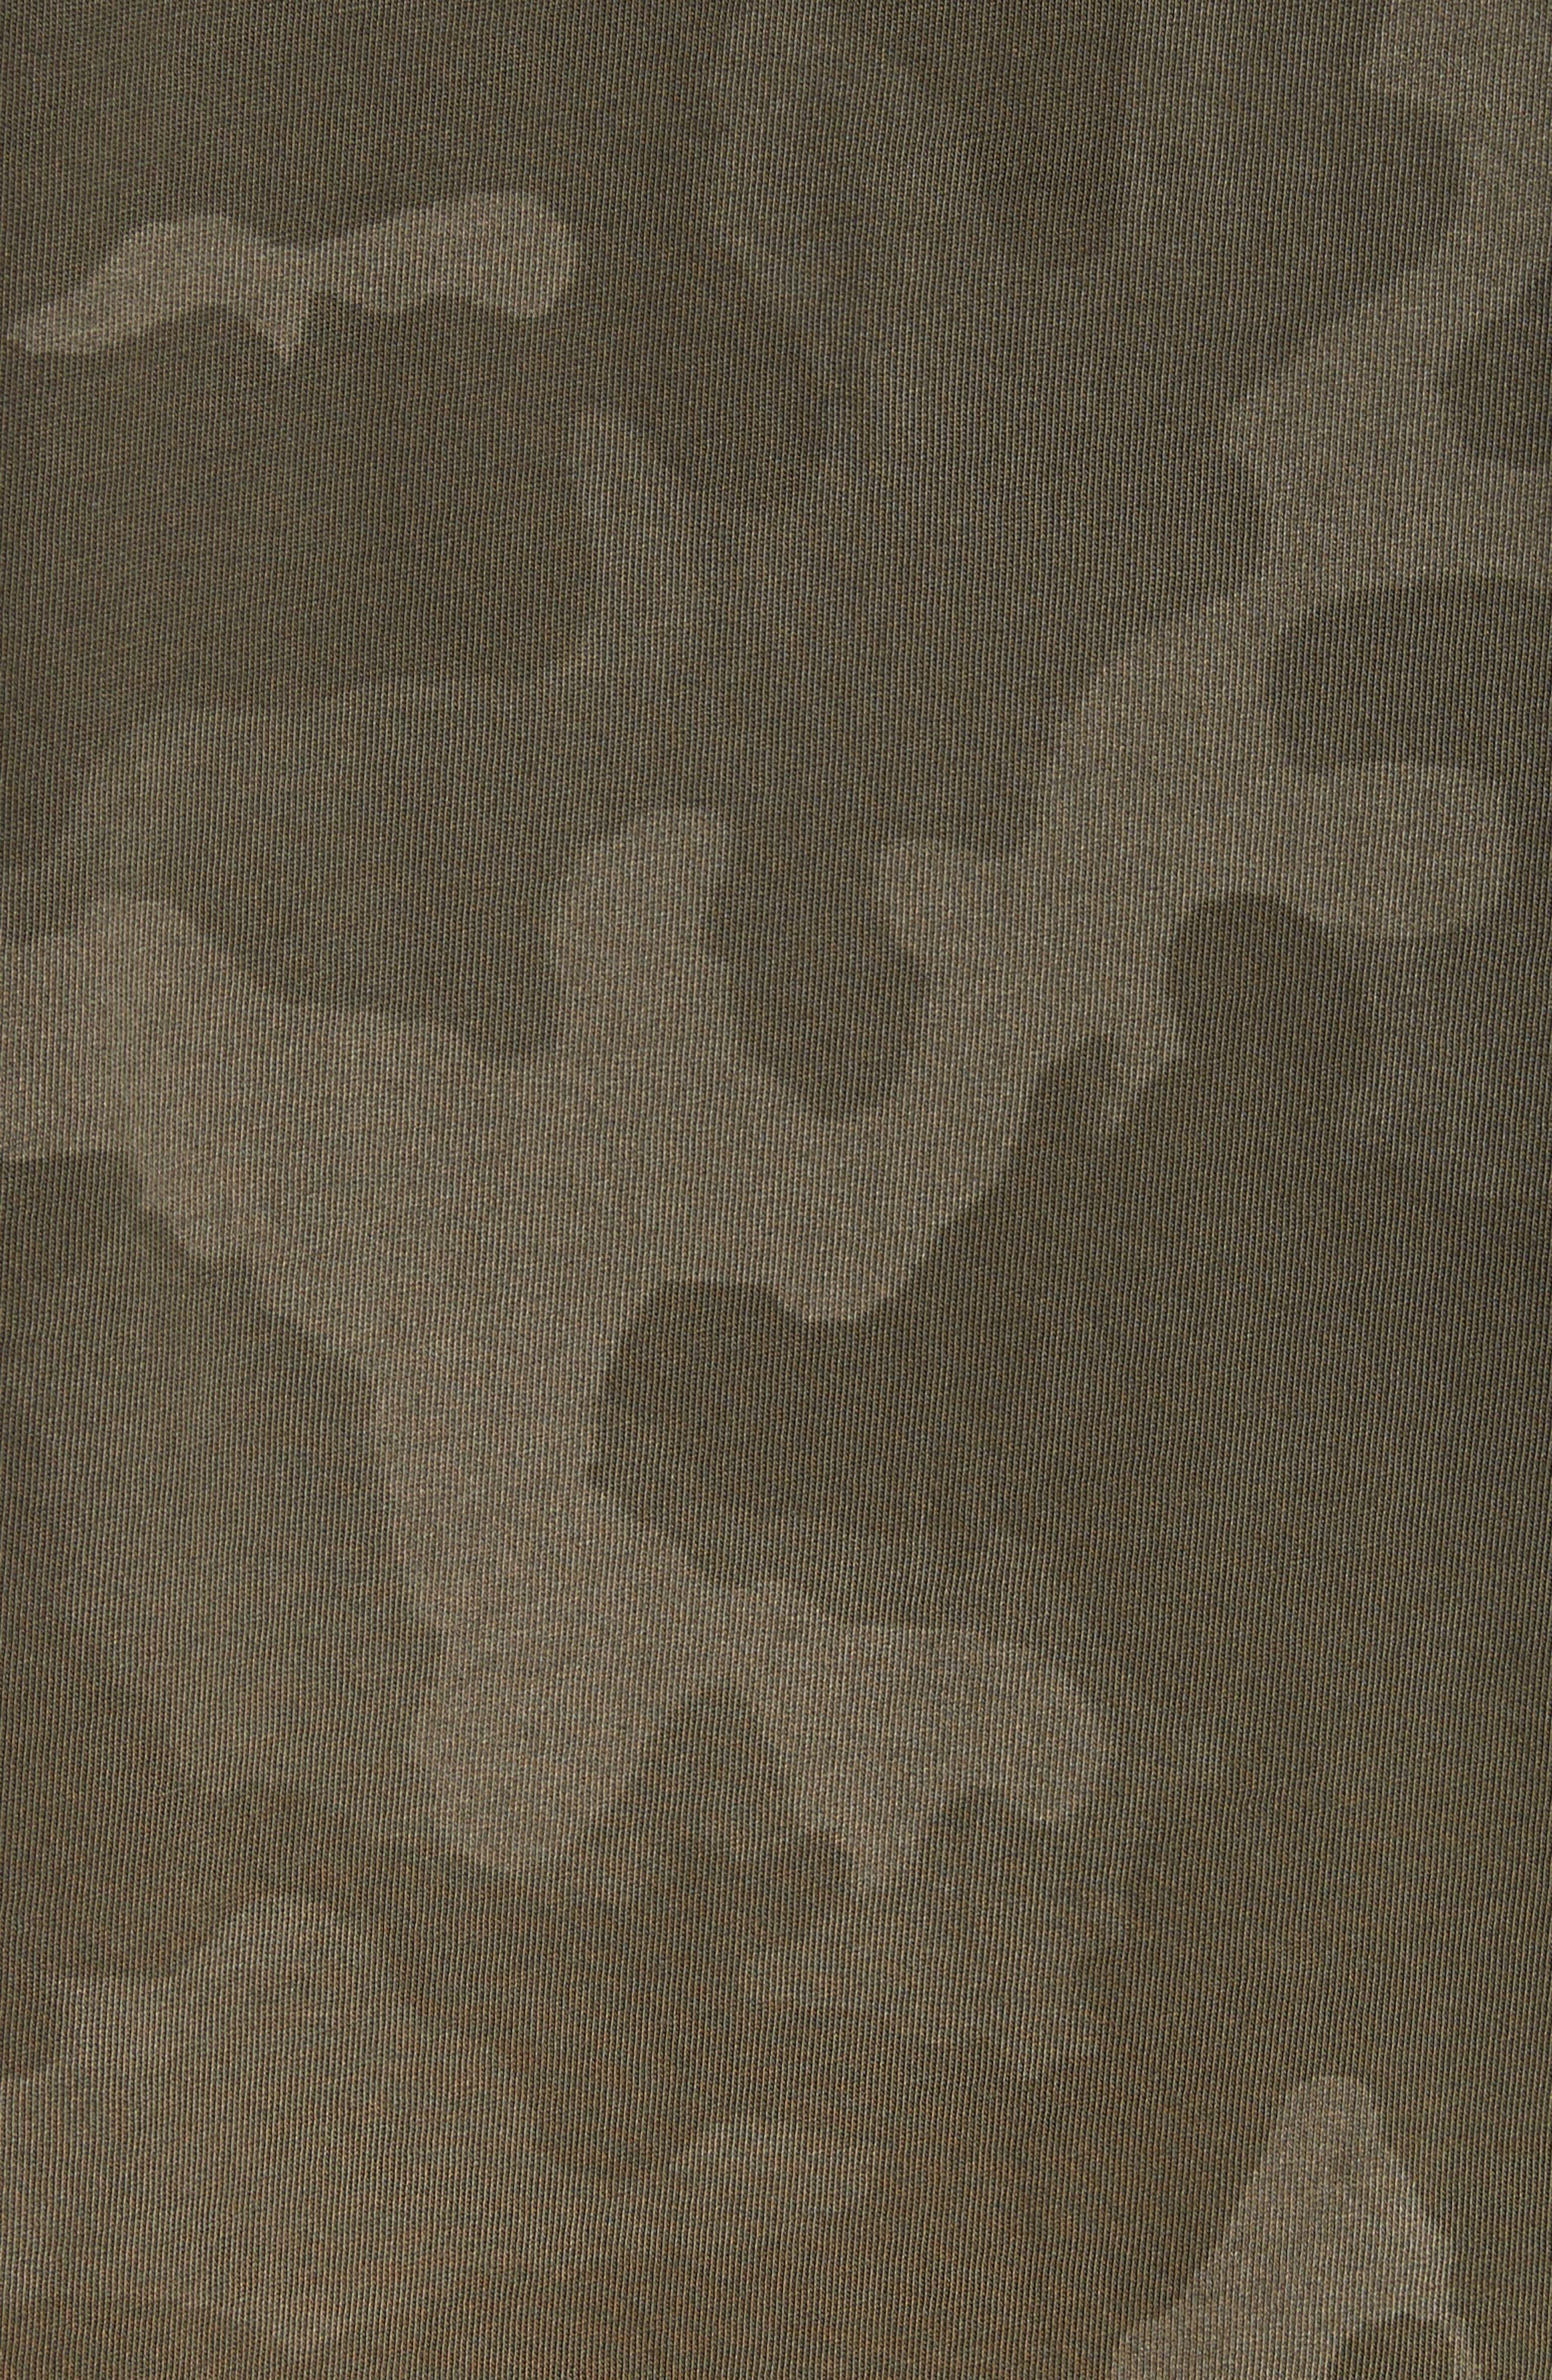 Camo Print Crewneck T-Shirt,                             Alternate thumbnail 5, color,                             341